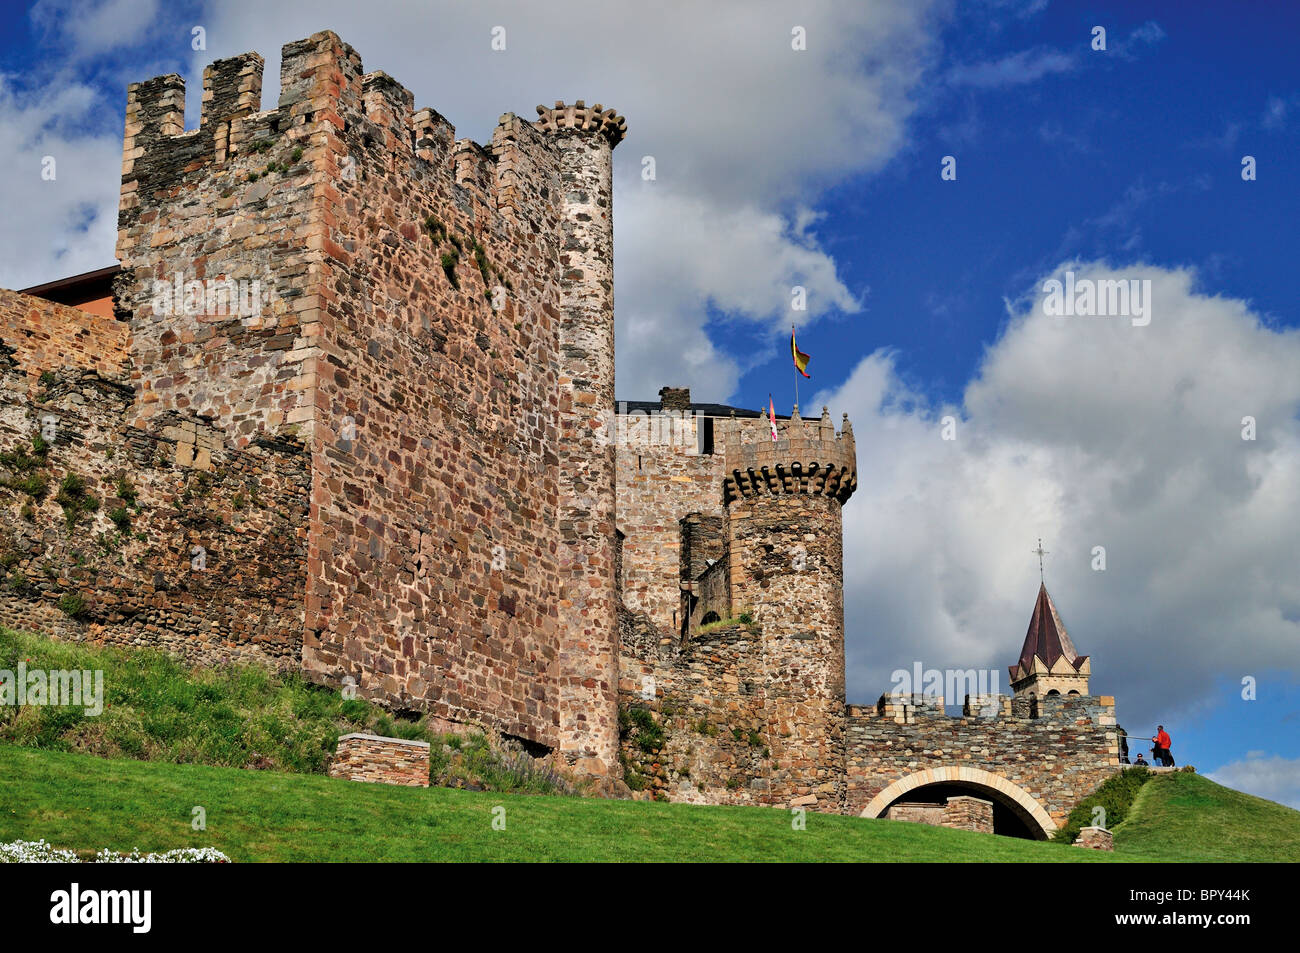 Spain, St. James Way: Medieval Castle of Ponferrada - Stock Image